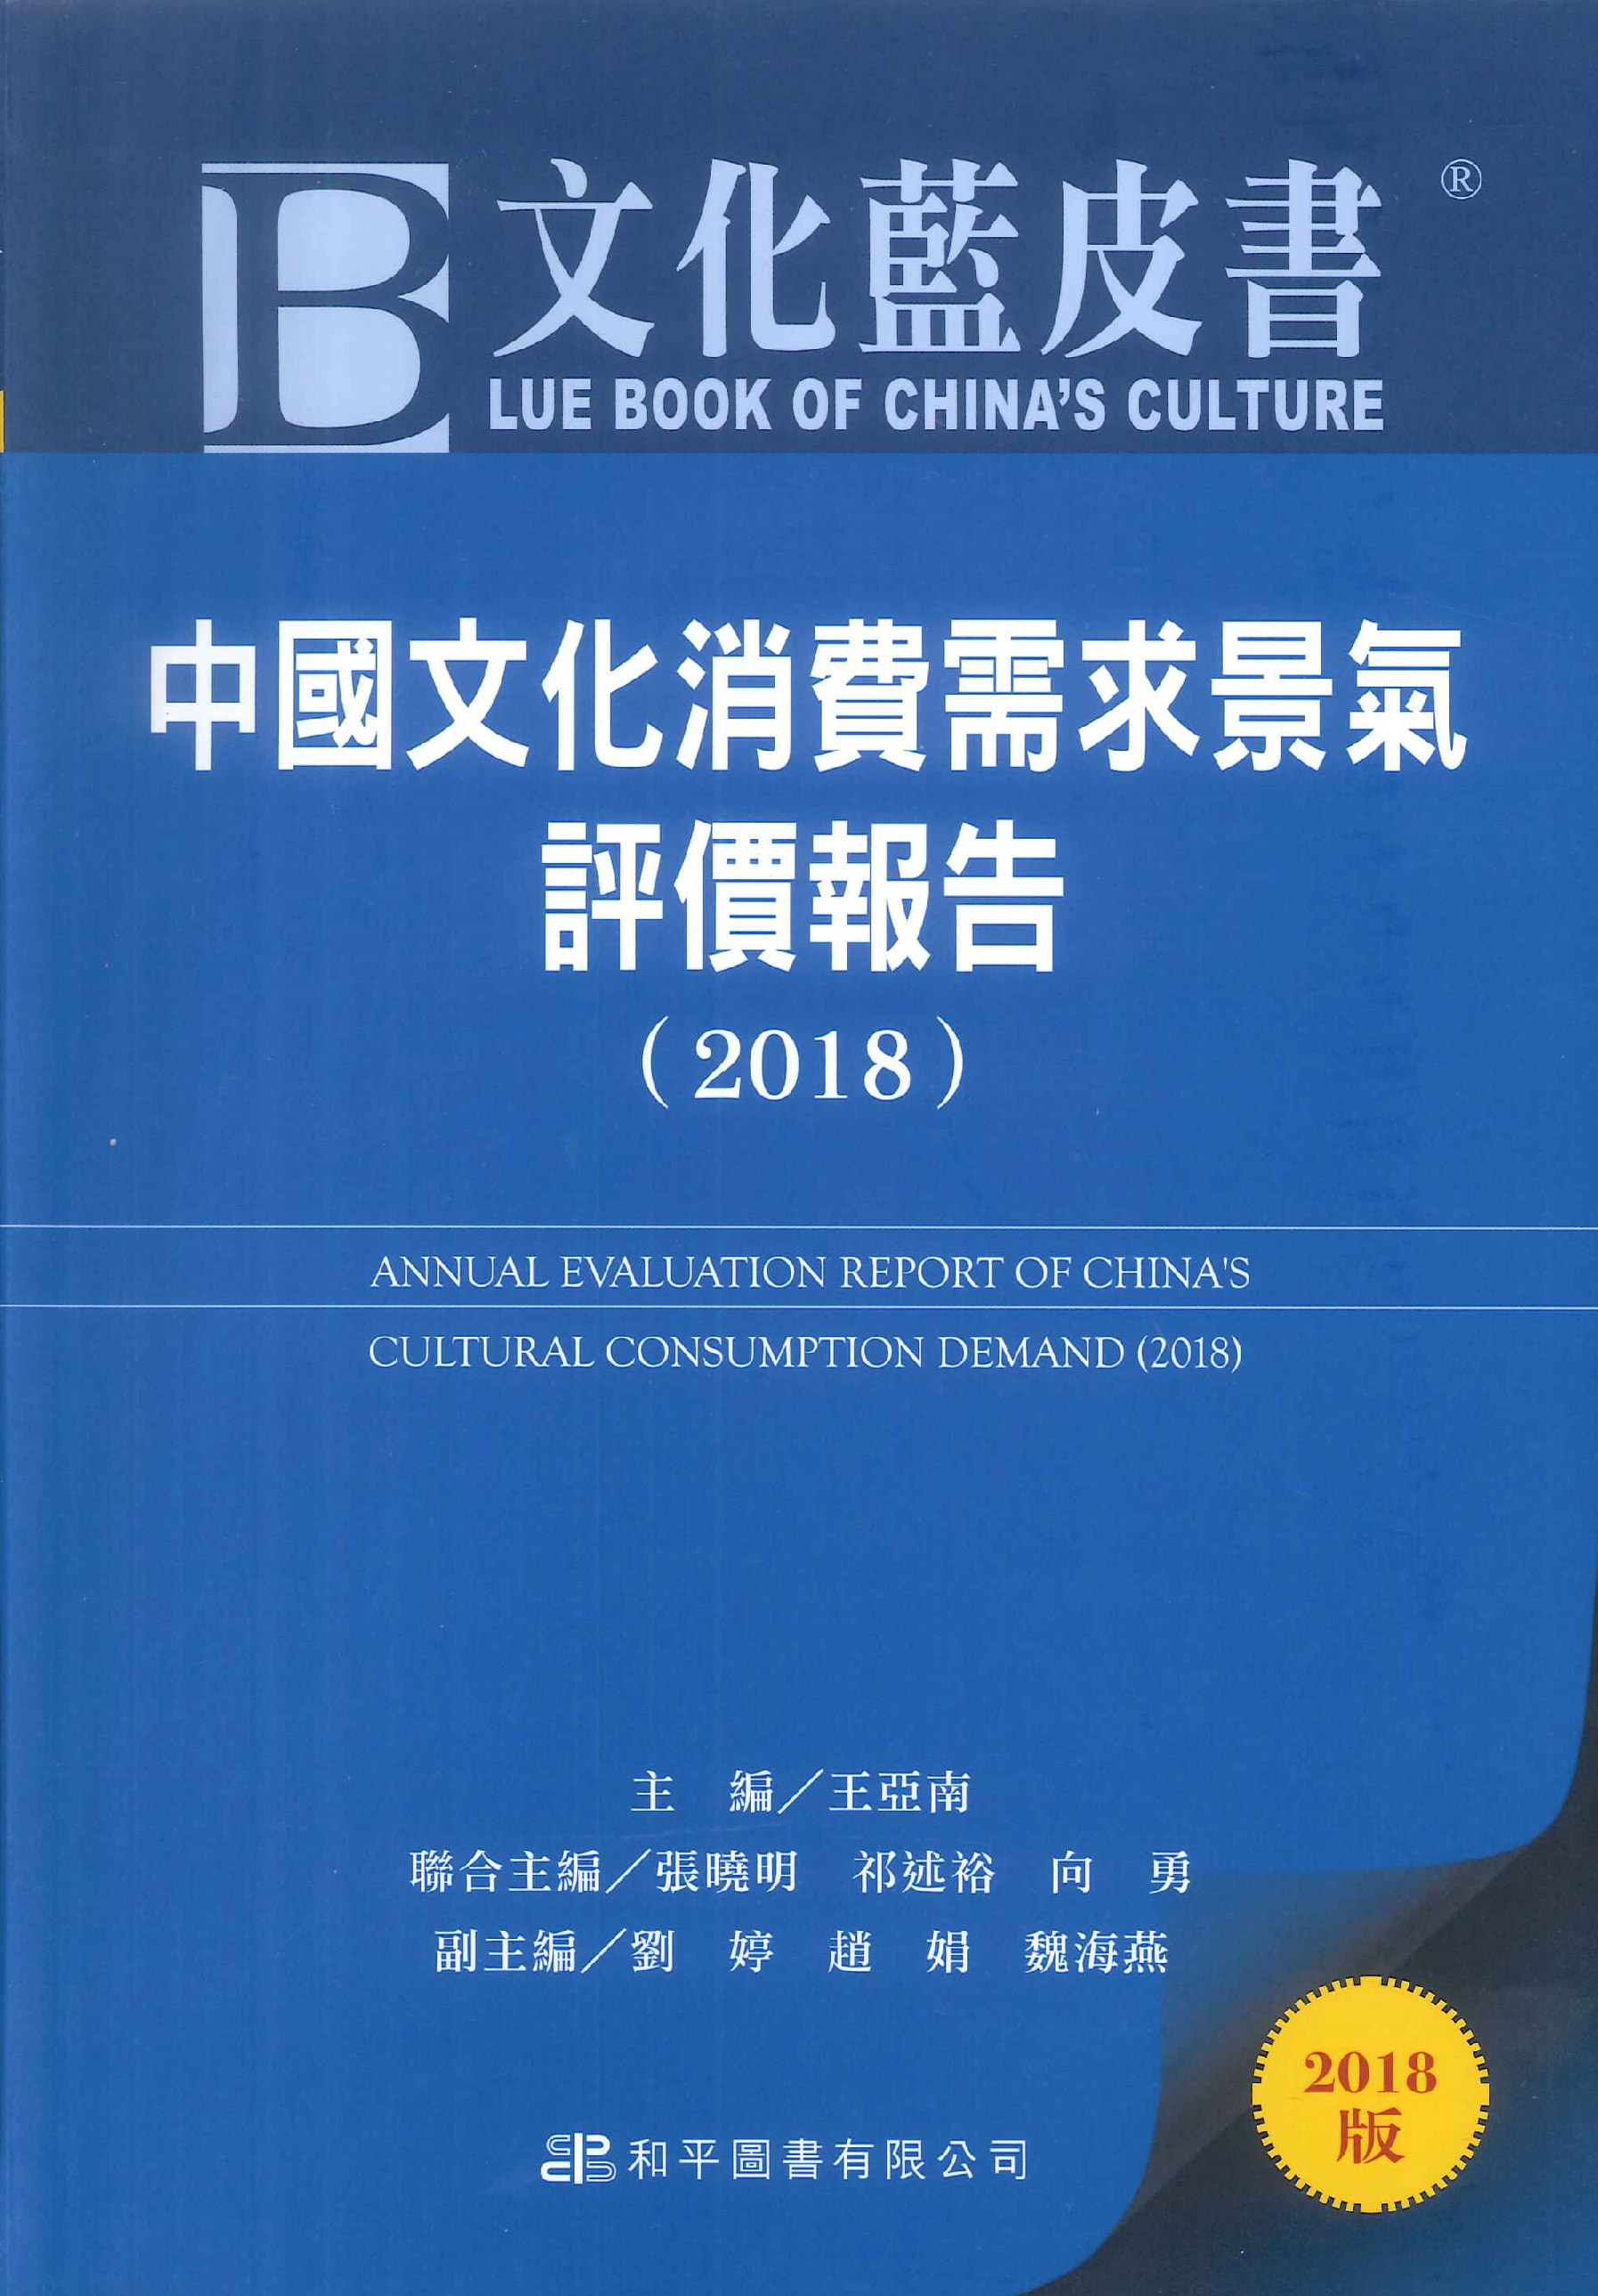 中國文化消費需求景氣評價報告.2018=Annual evaluation report of China